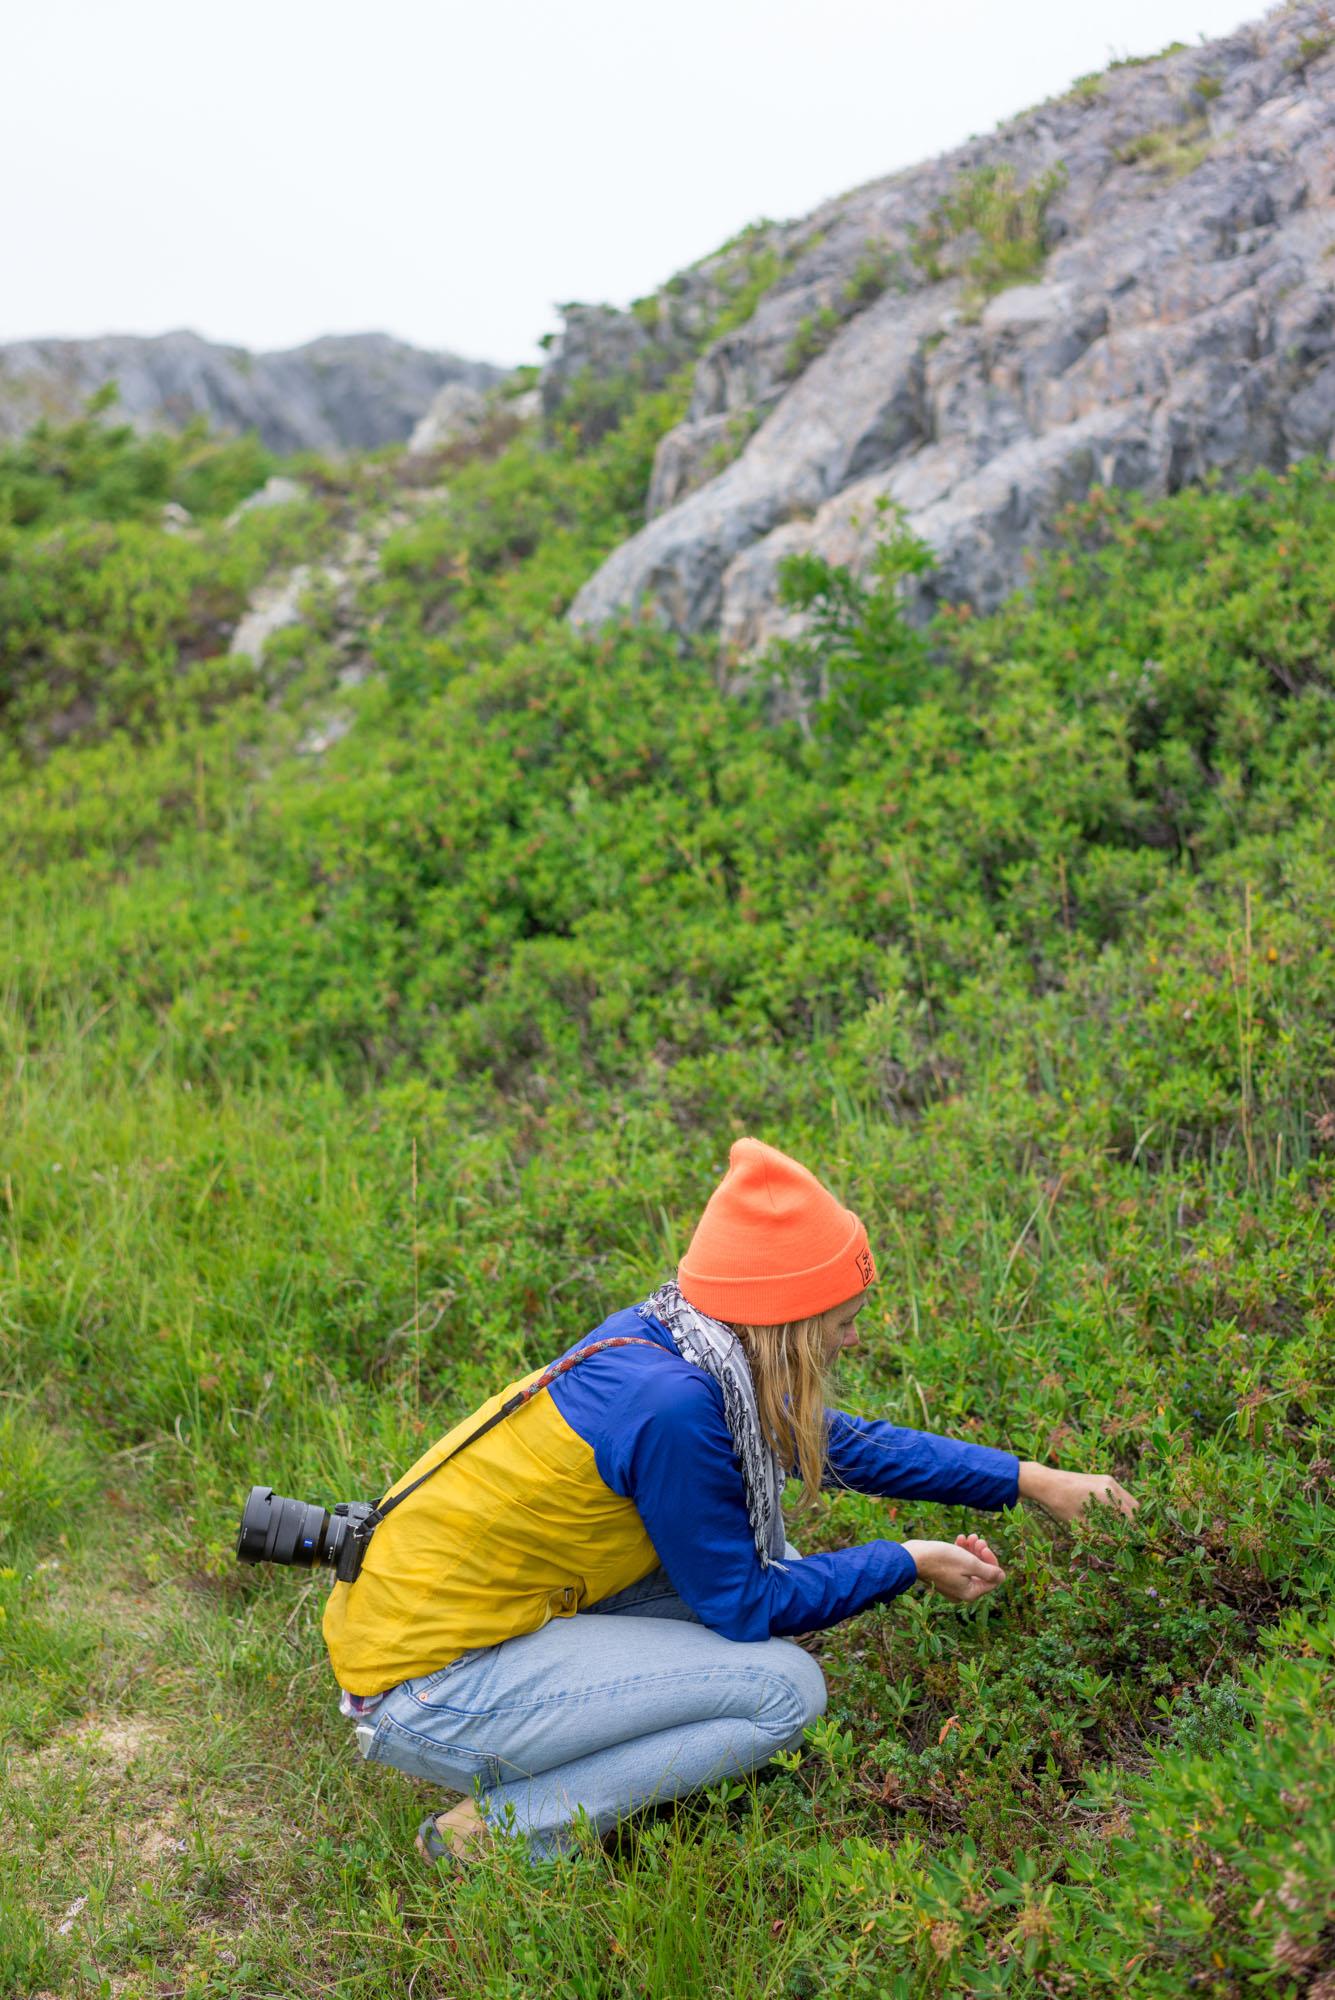 MAK picking blueberries on the hike up to Brimstone Head